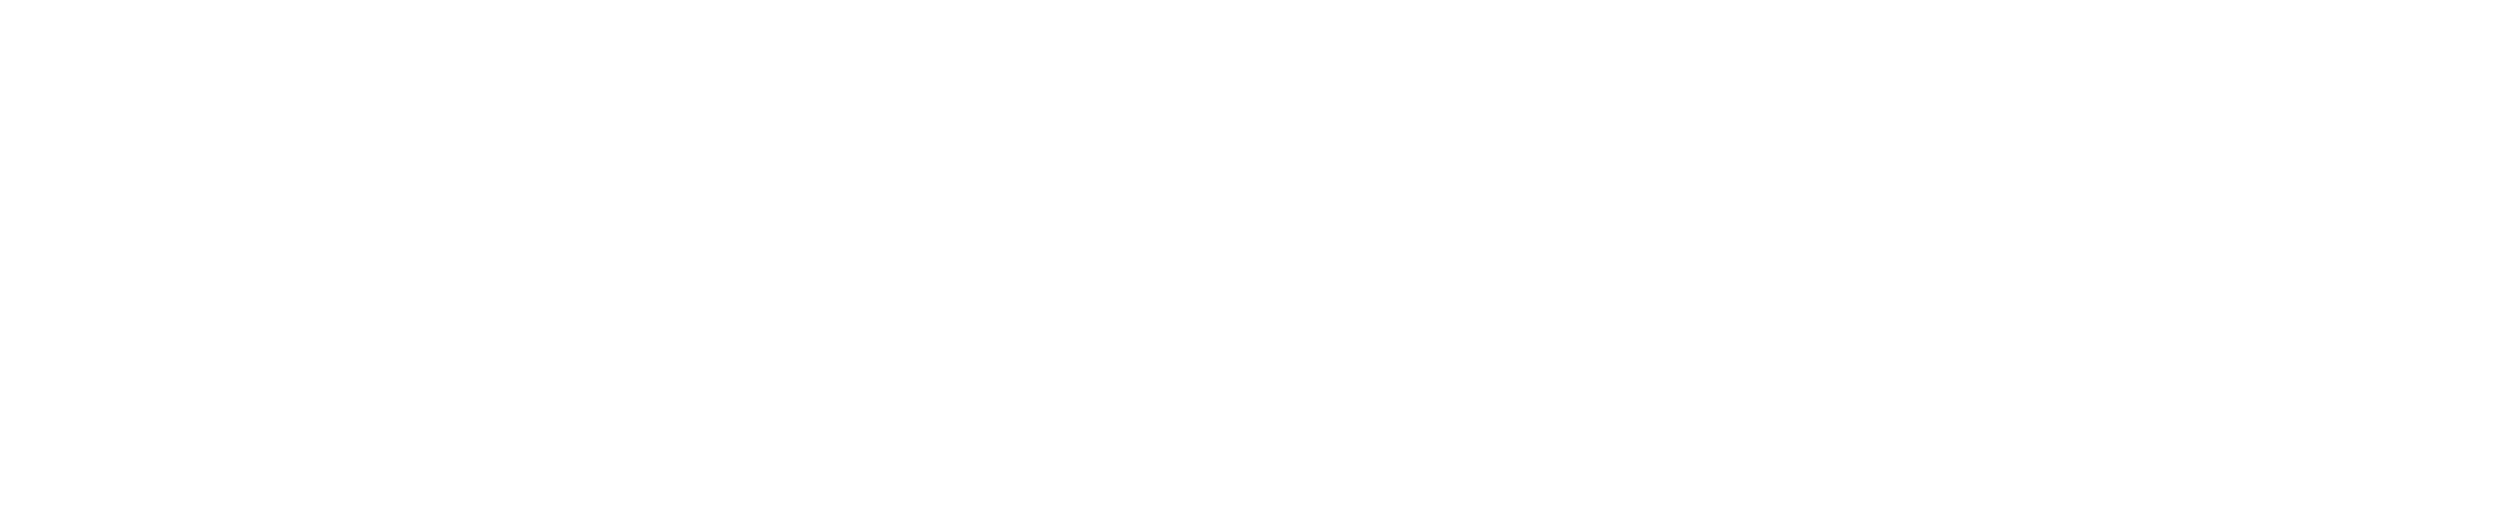 TI logo 2016 white.png